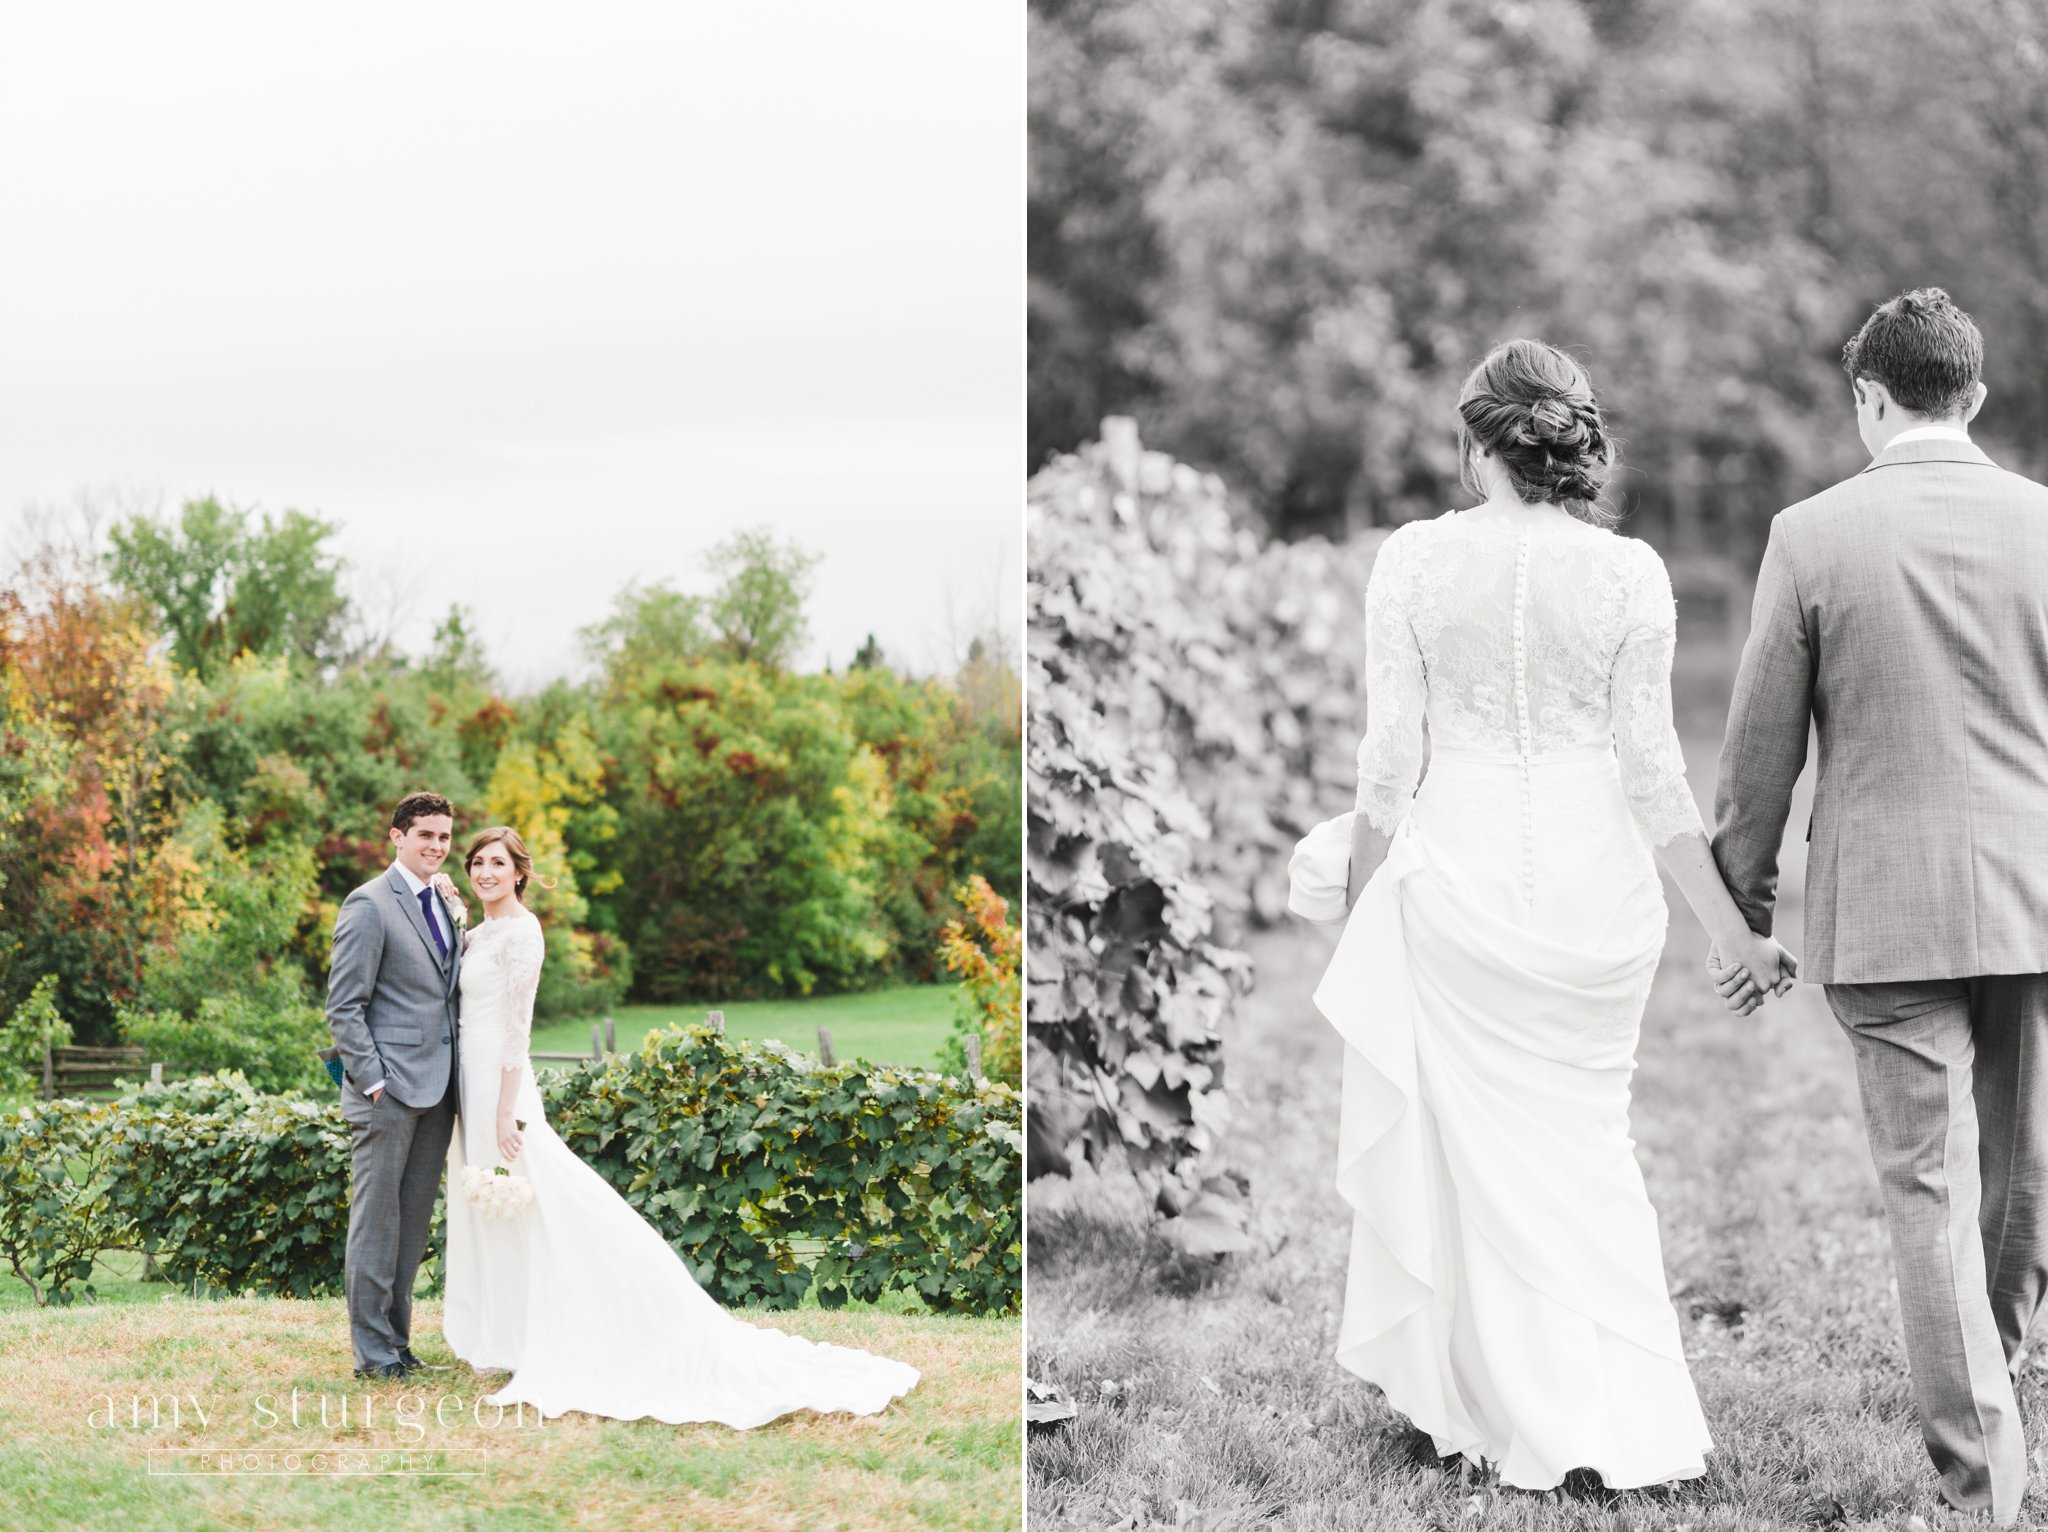 The bride and groom made posing look easy at the alpaca farm wedding